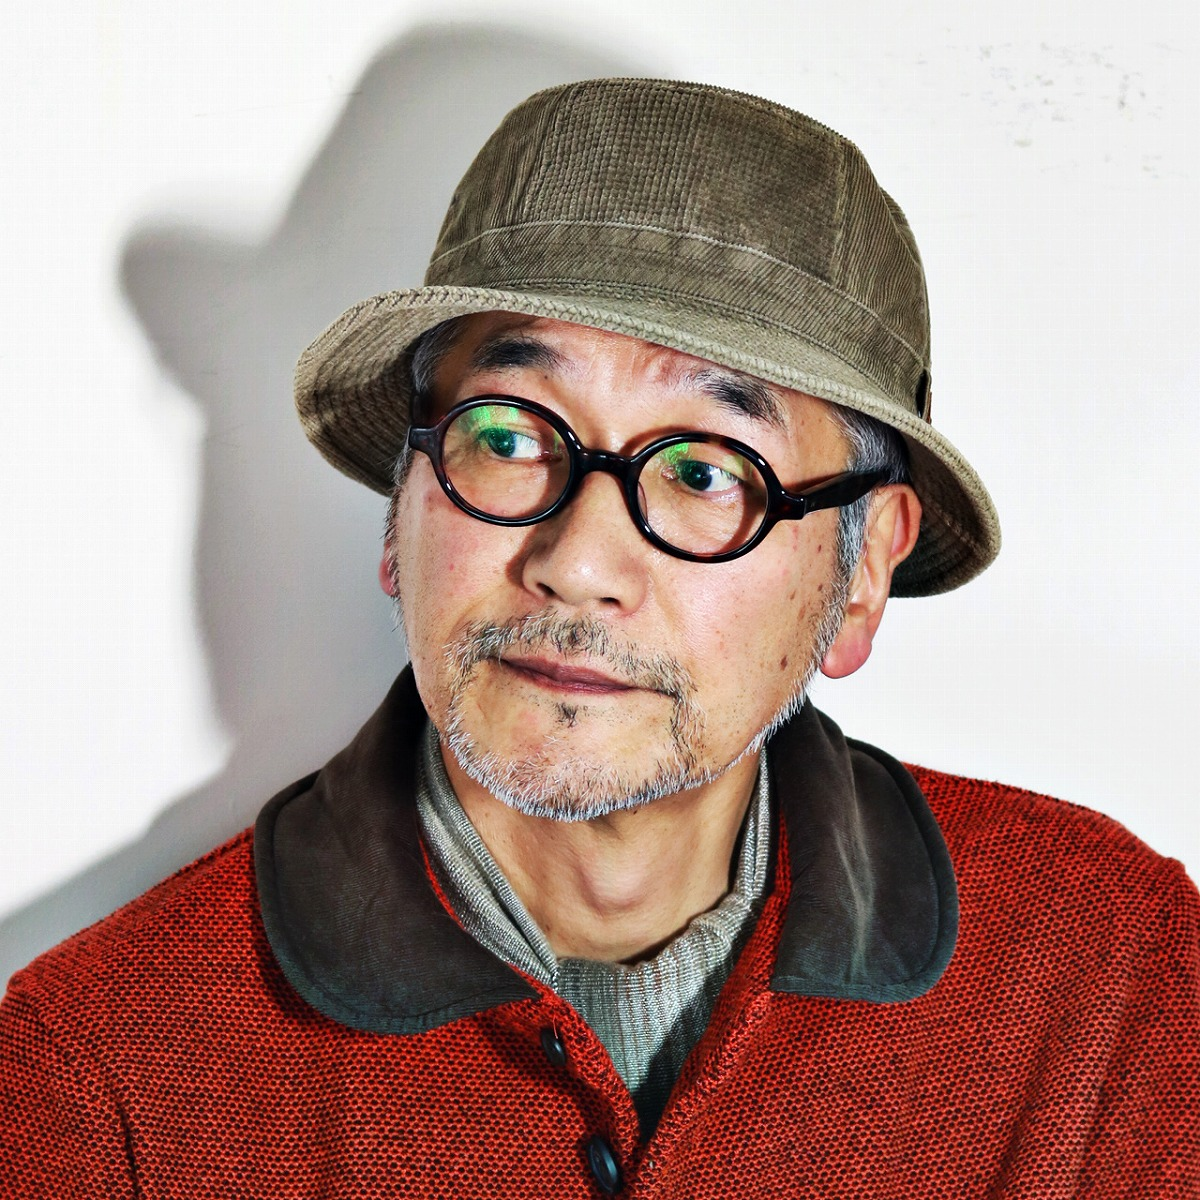 Cap Hat mens borsalino corduroy sahari Hat autumn winter corduroy   in tea  (Safari Hat borslino made in Japan winter cap and fashionable gift men s  men s ... 1fe9c7208797